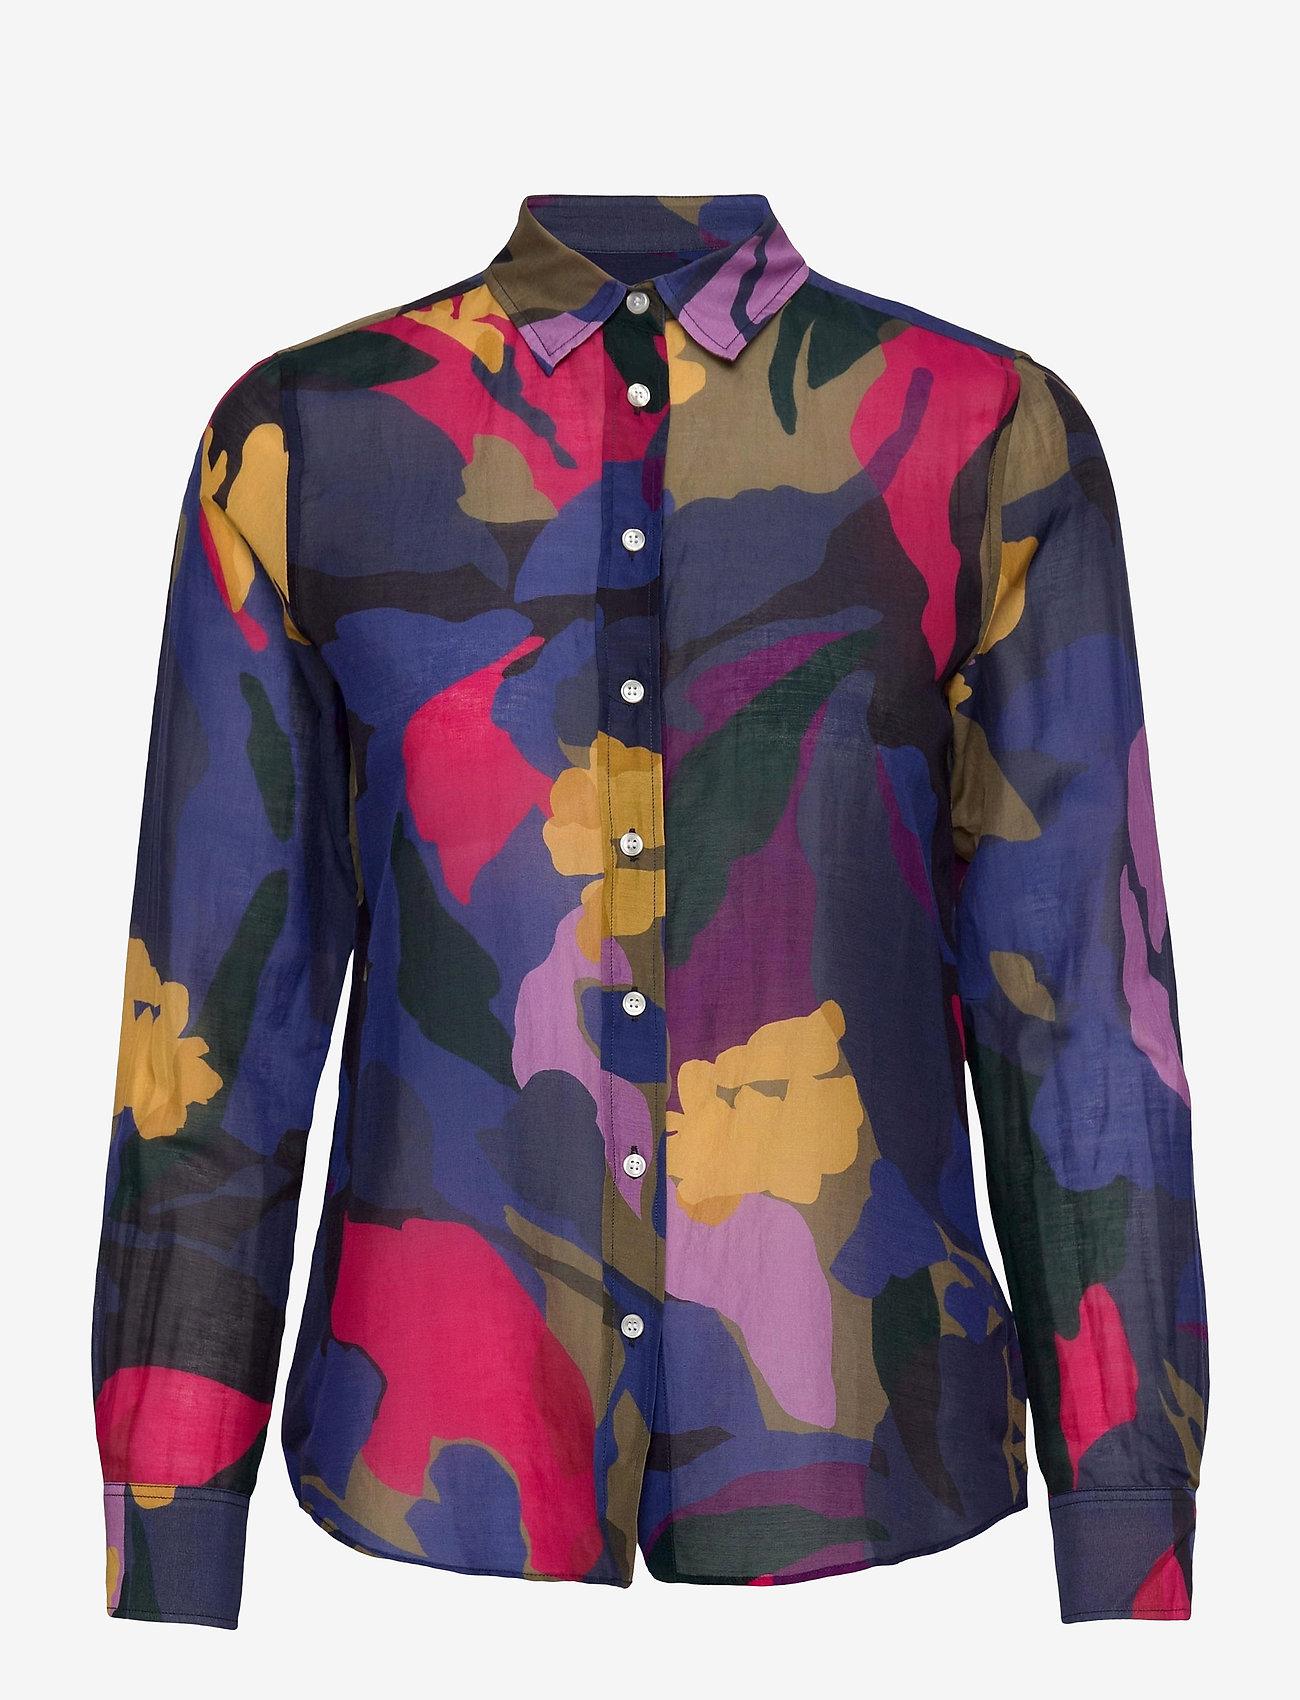 GANT - D1. SPLENDID FLORAL COT SILK SHIRT - long-sleeved shirts - multicolor - 0